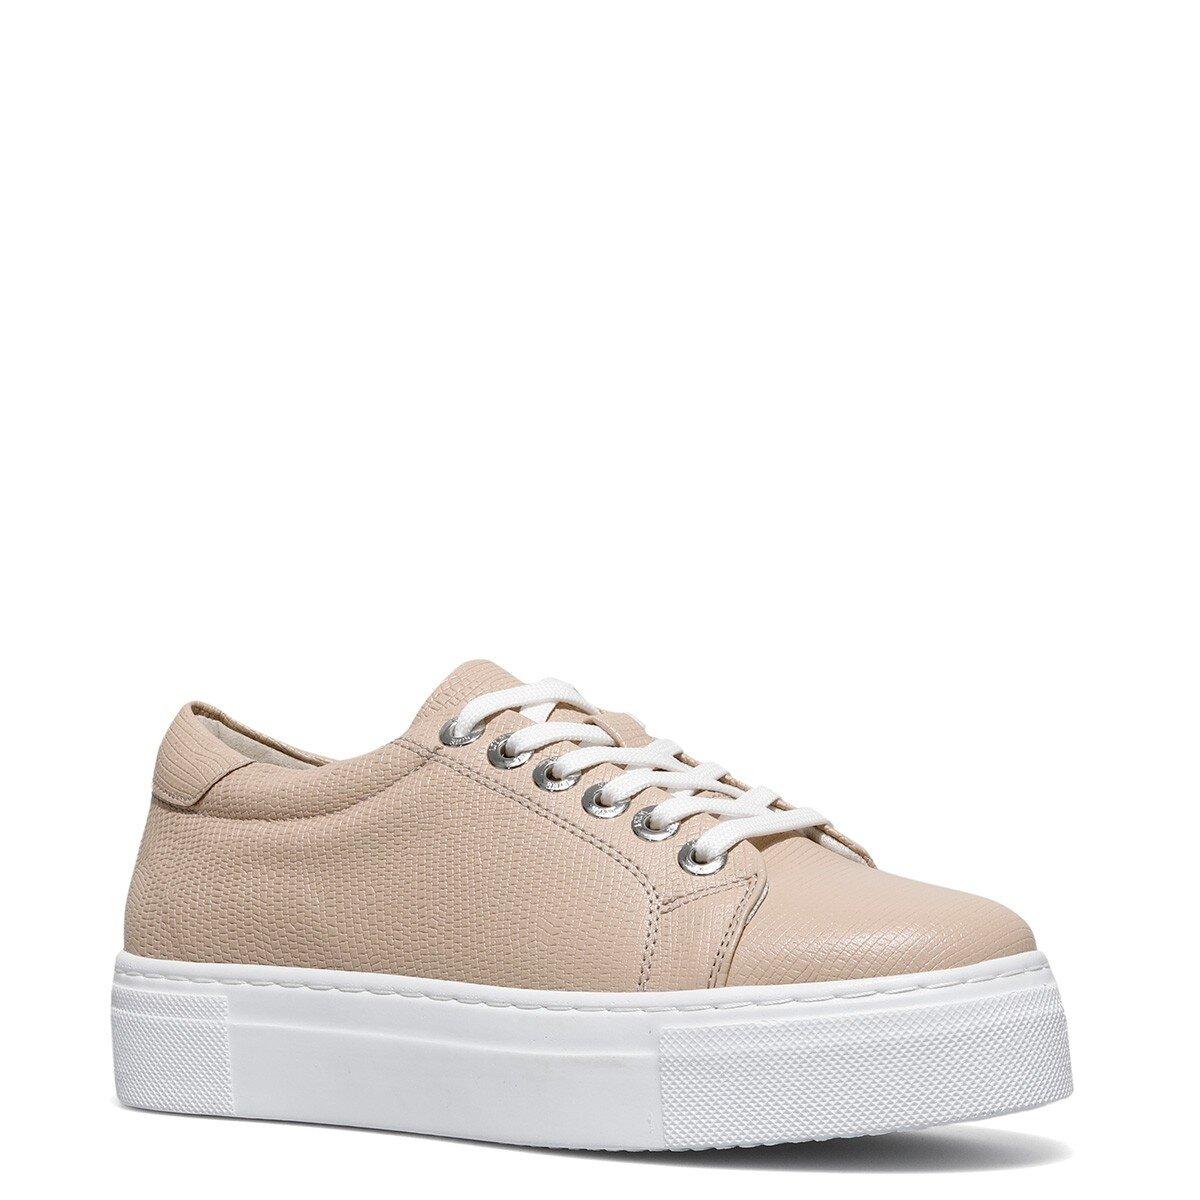 YUMARE 1FX Pudra Kadın Havuz Taban Sneaker